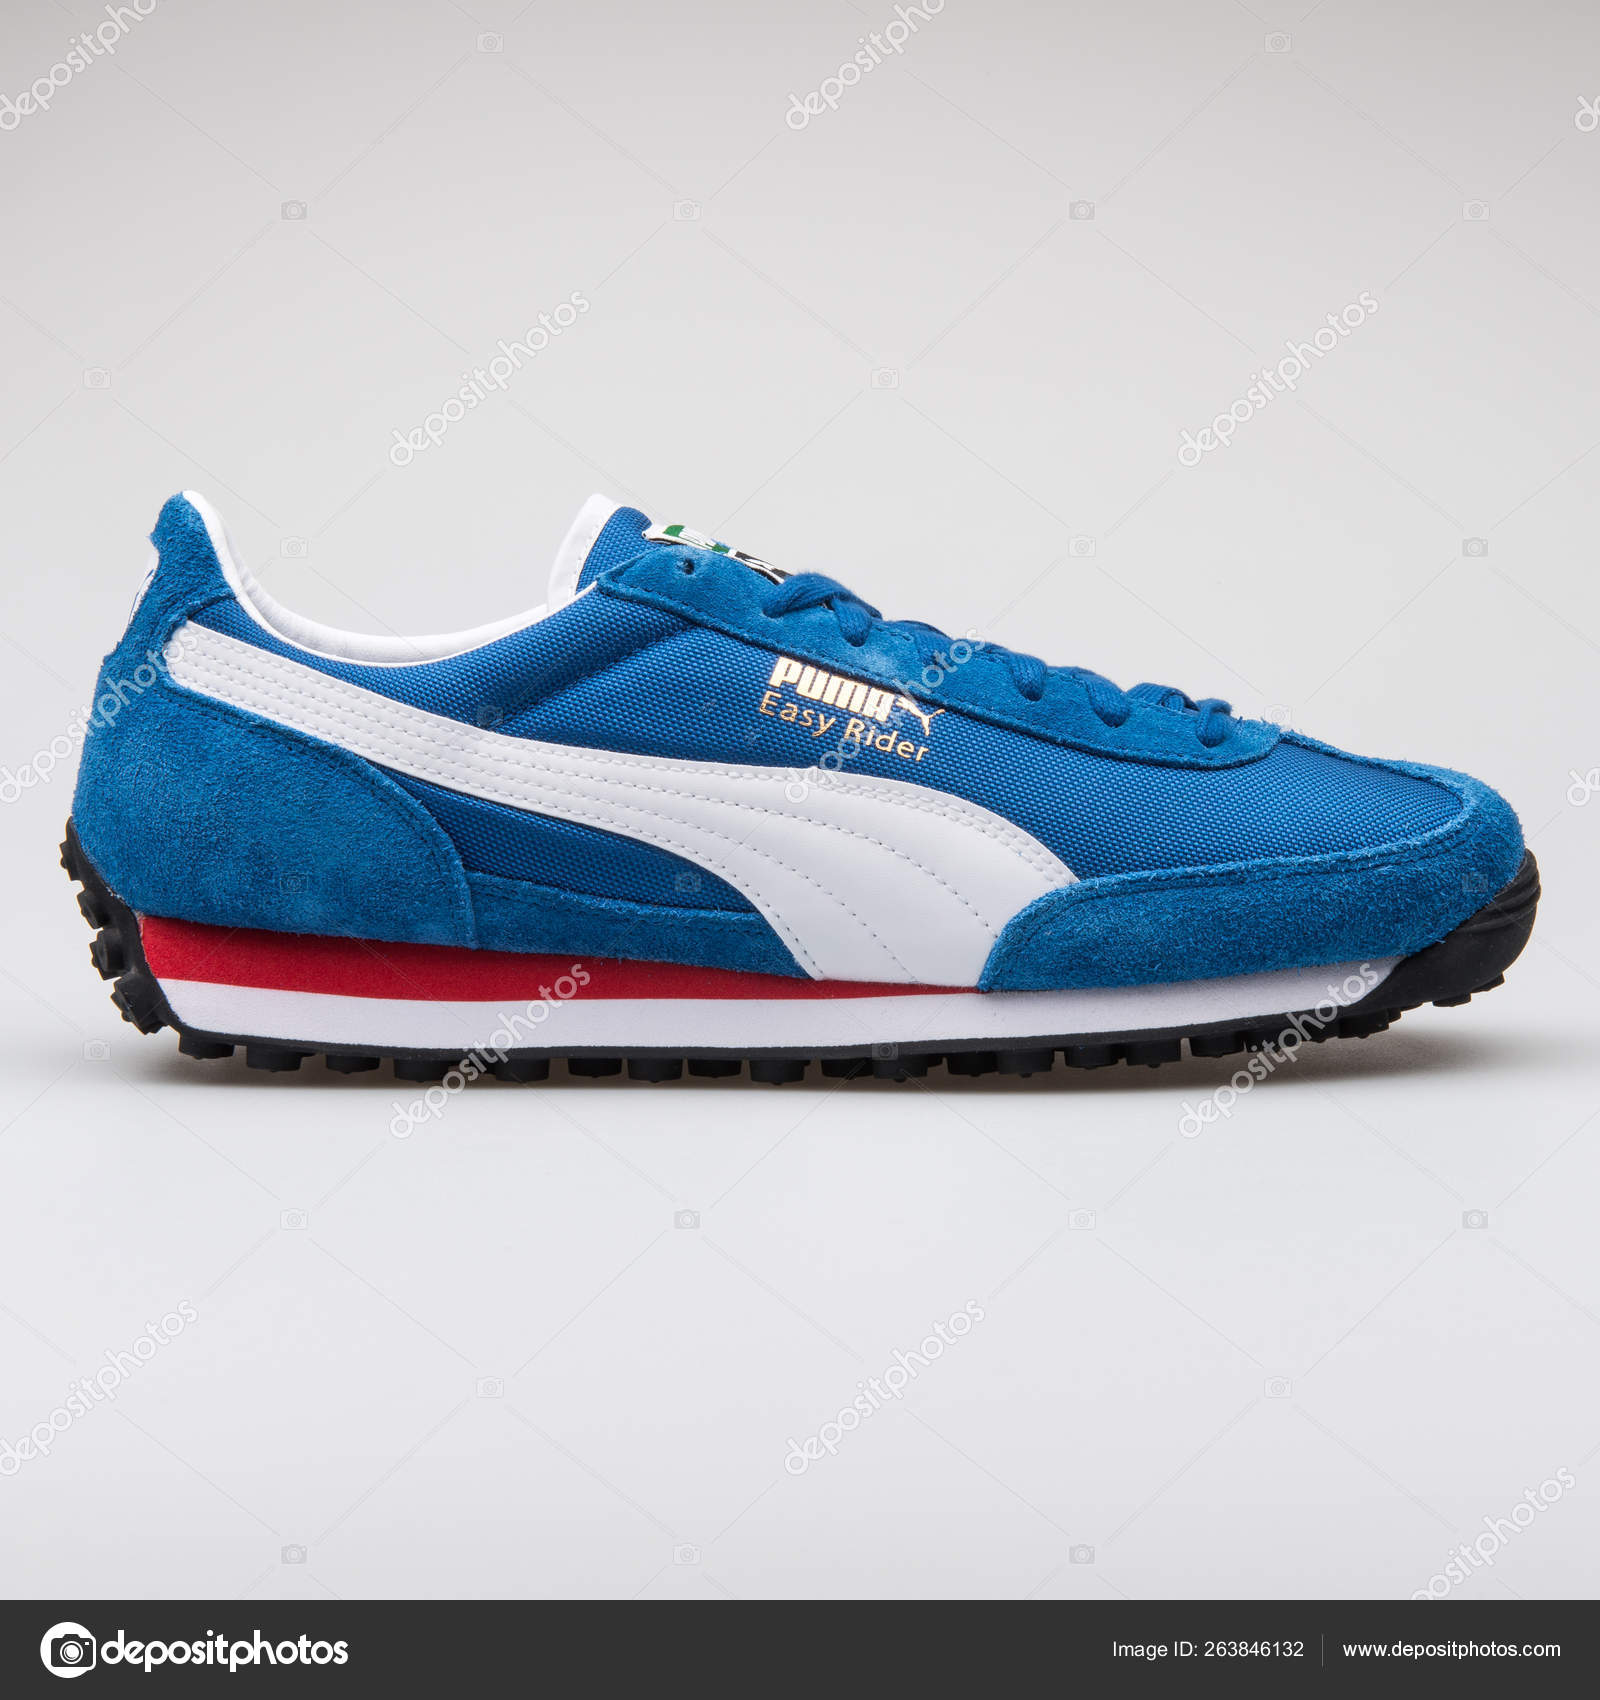 Puma Easy Rider blue sneaker – Stock